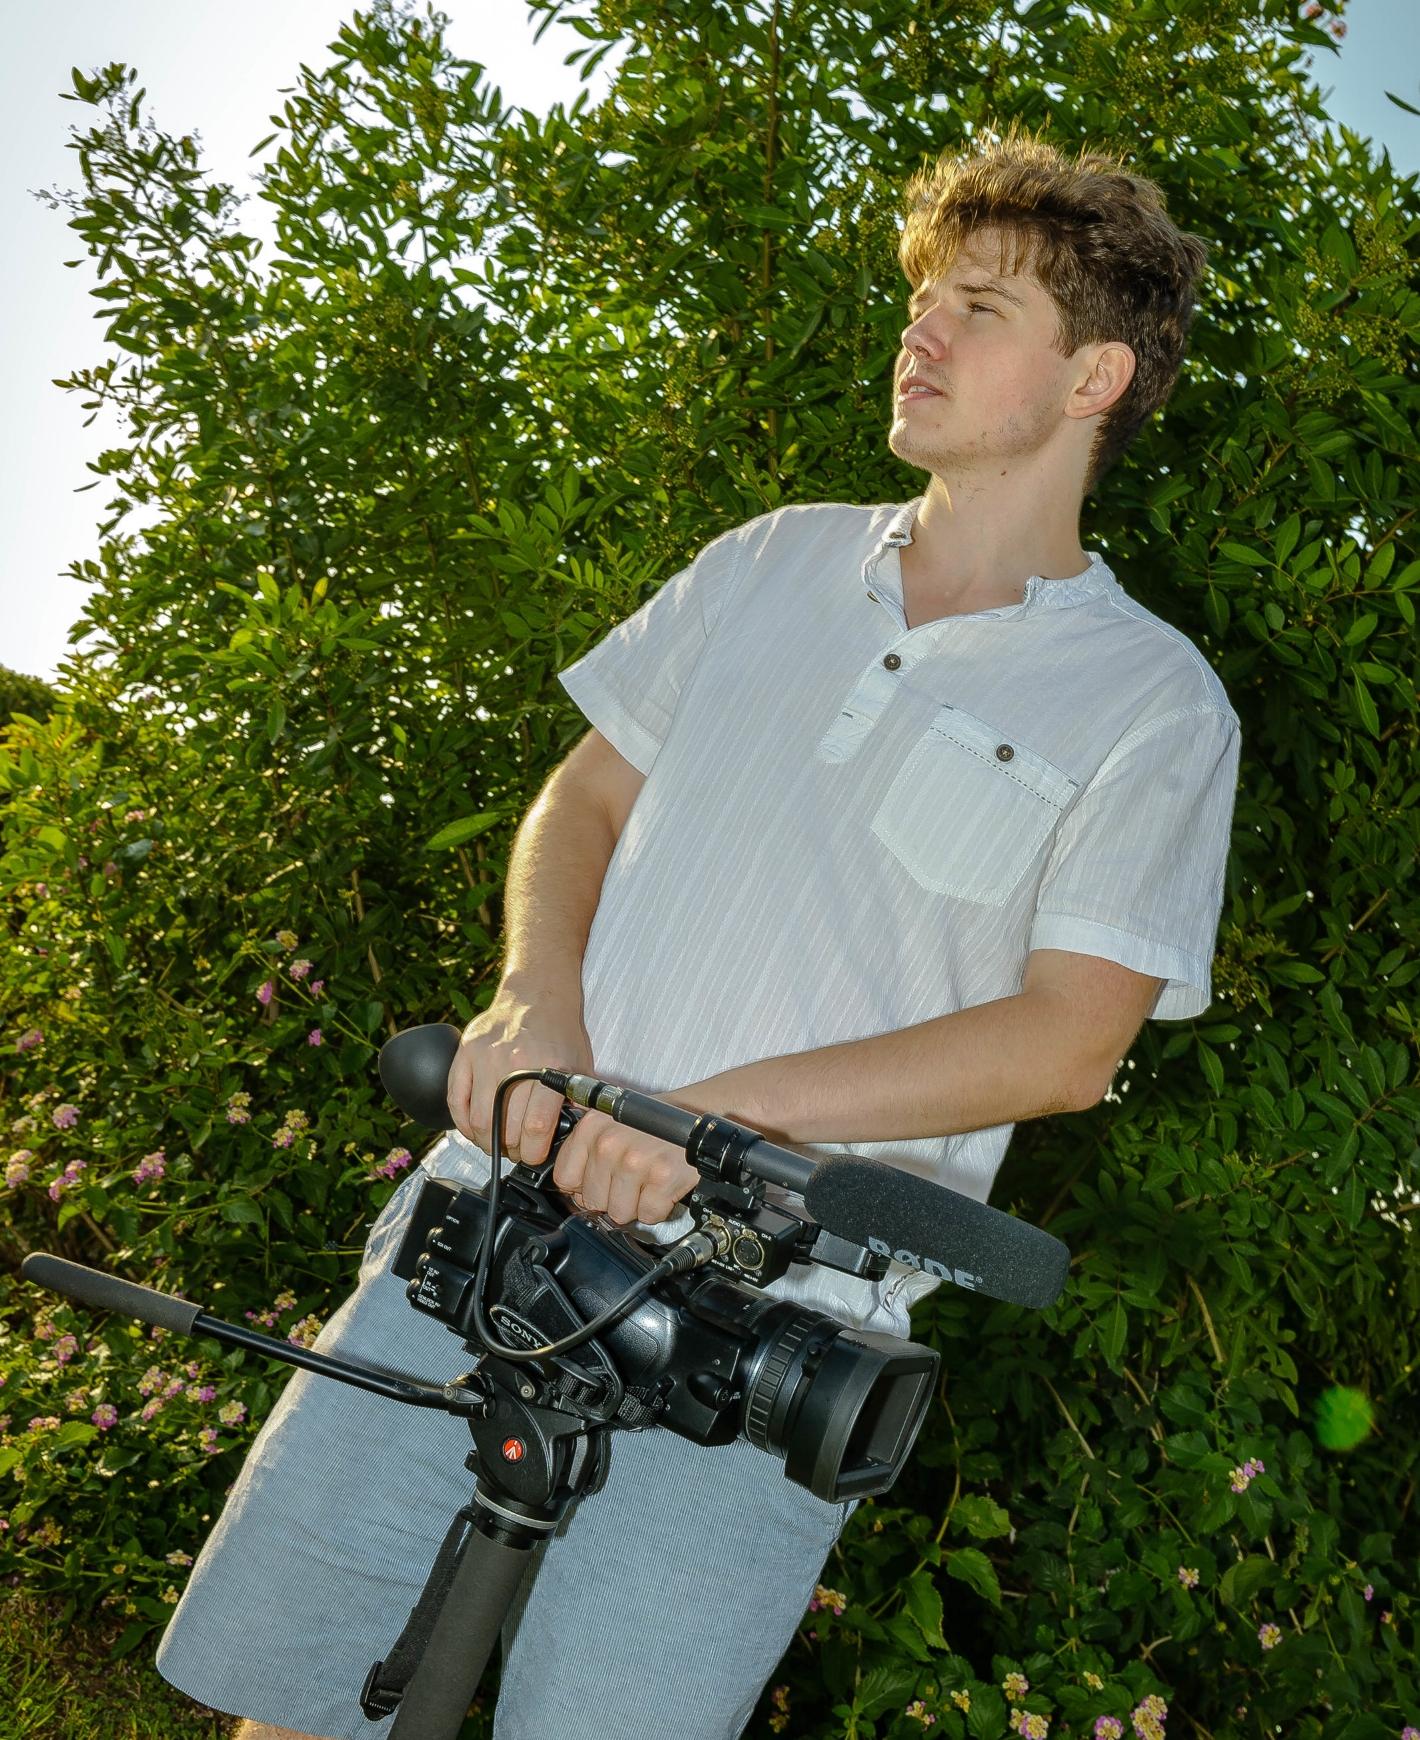 - James - Photographer, Videographer and video editor